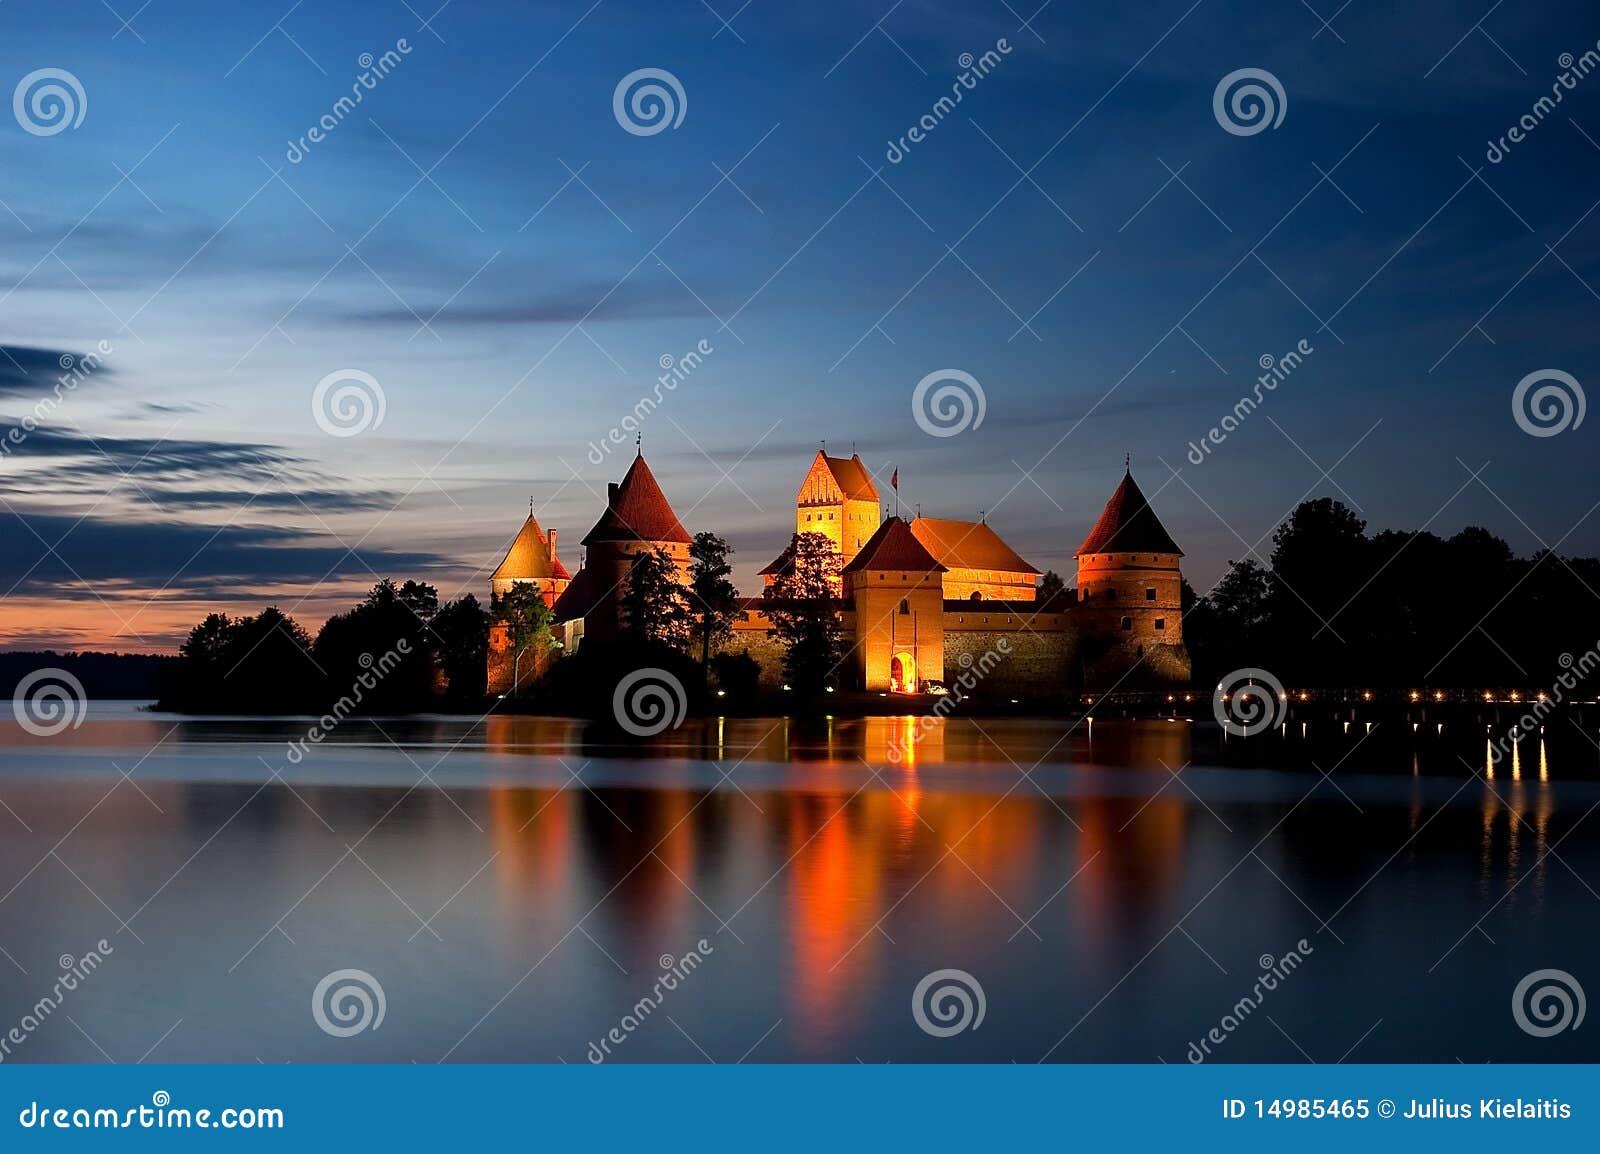 Island castle at night, Trakai, Lithuania, Vilnius